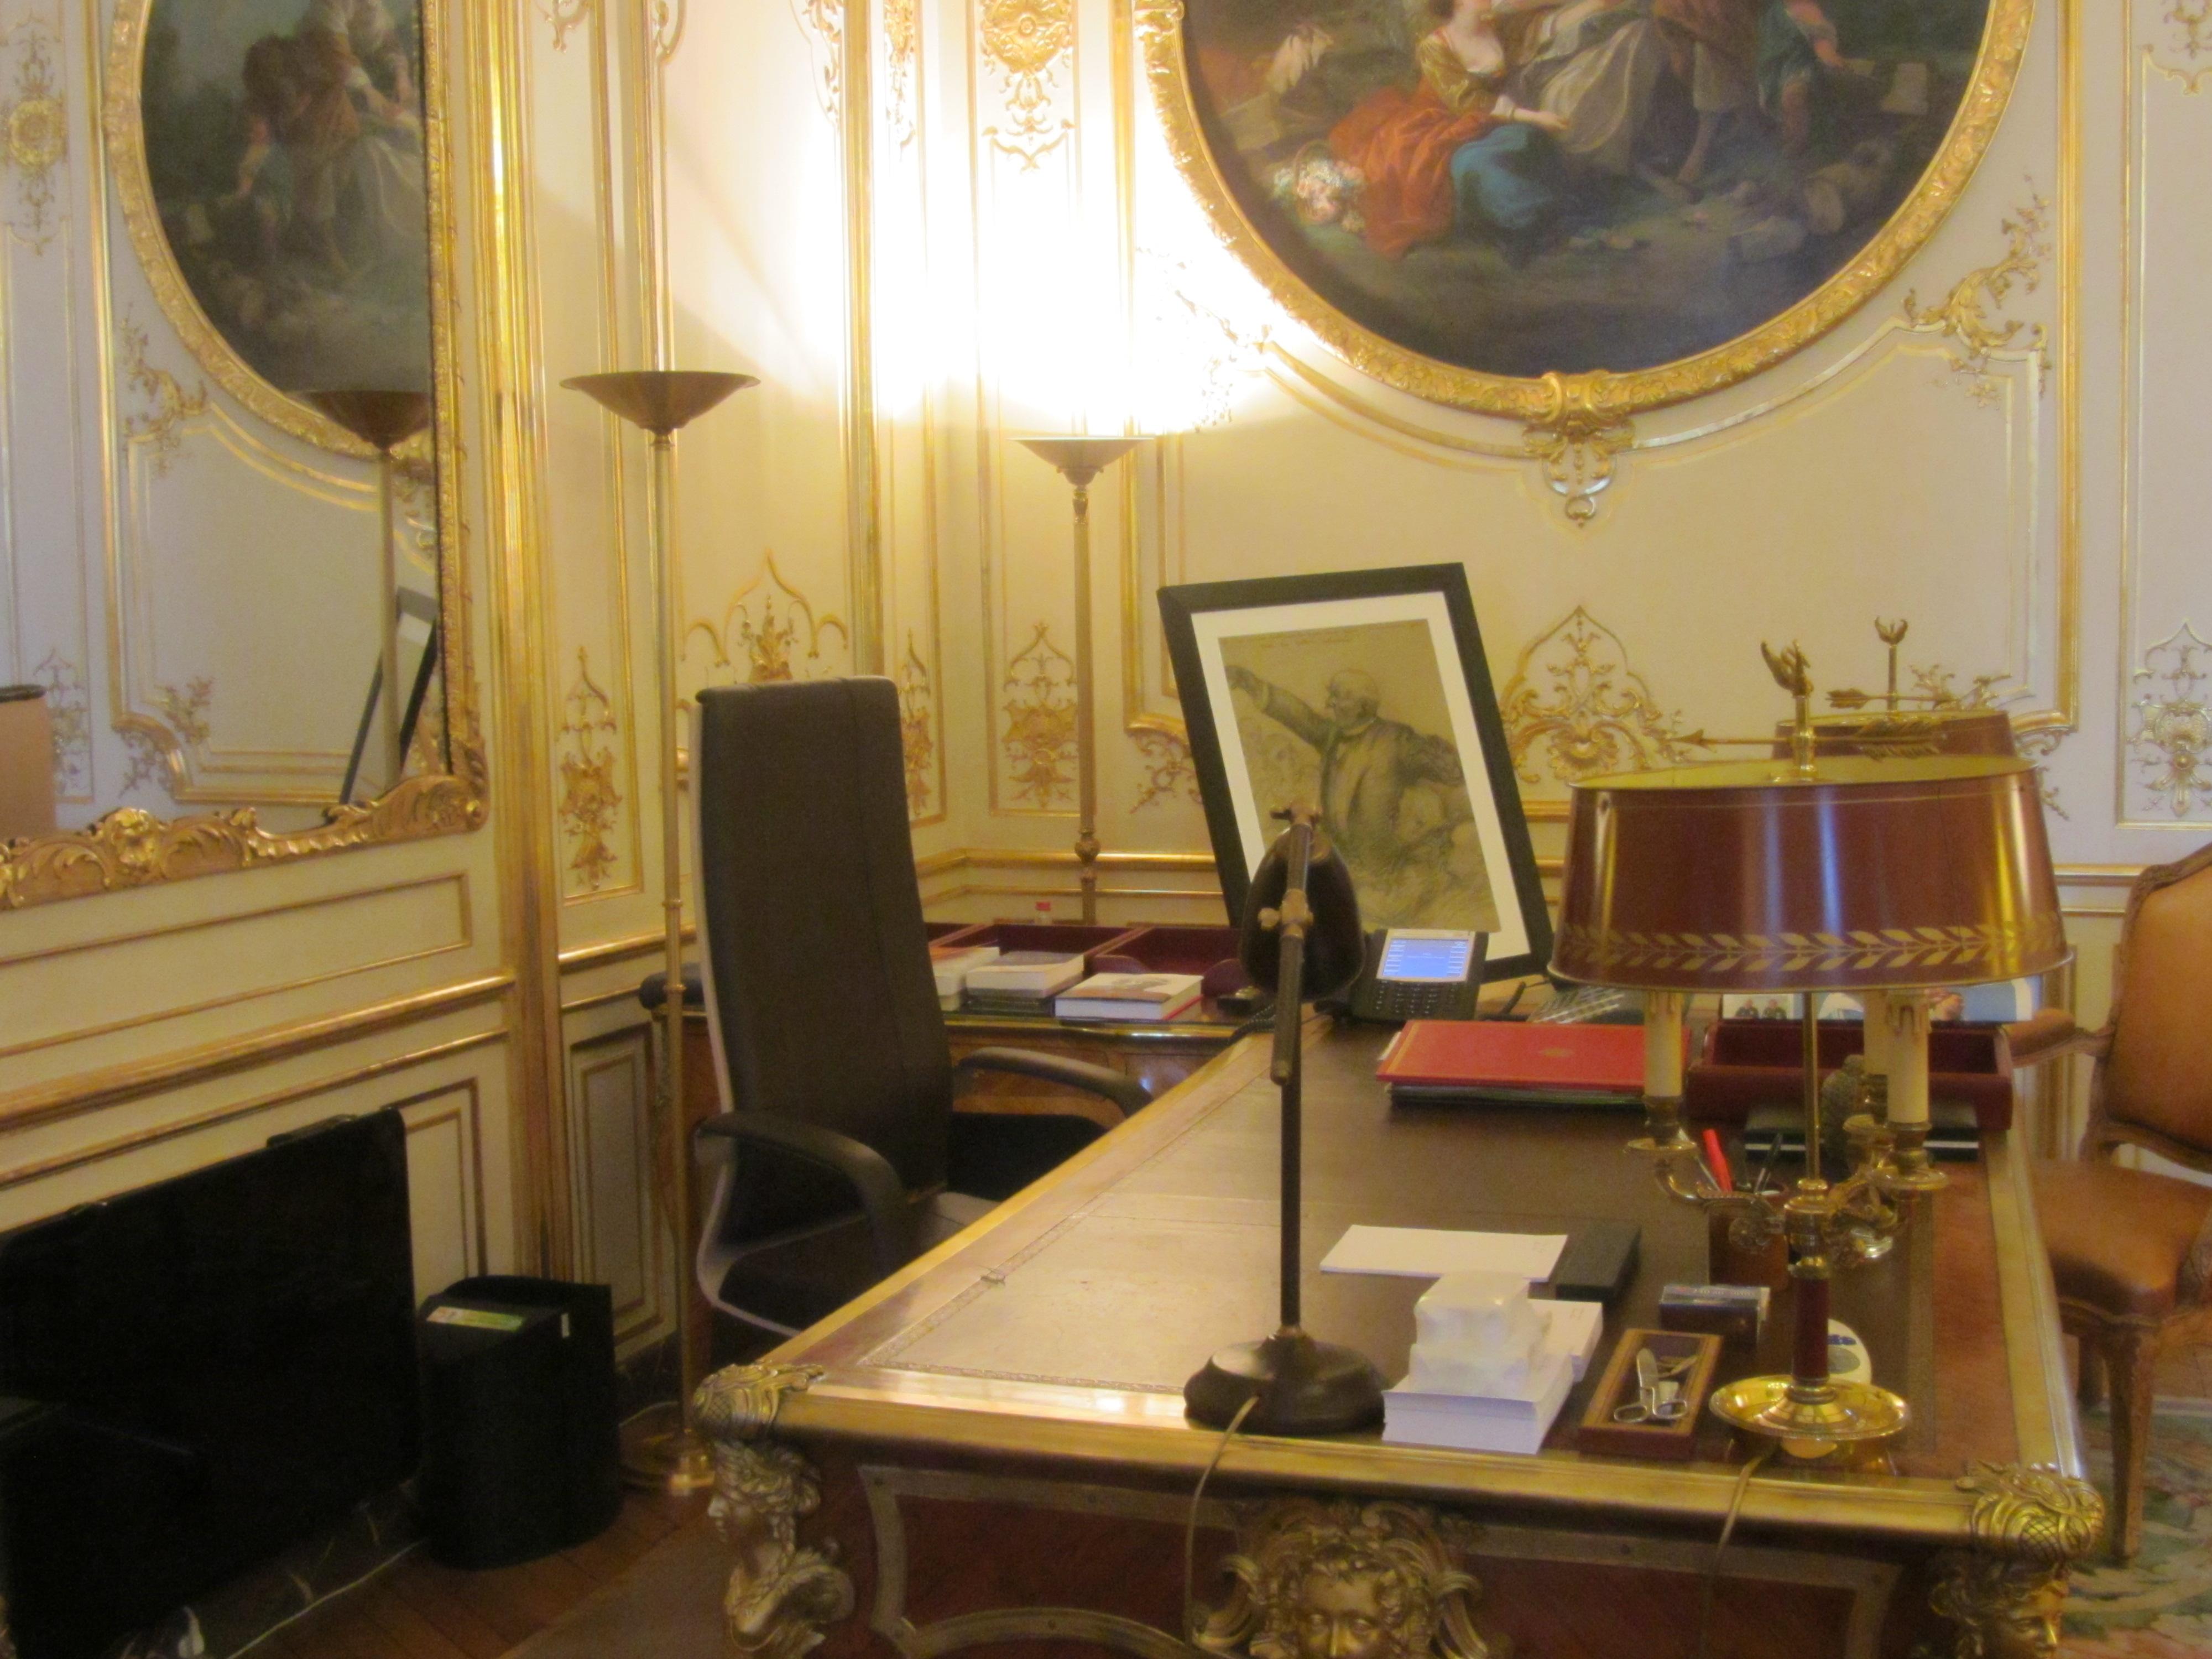 file h tel matignon bureau du premier ministre jpg wikimedia commons. Black Bedroom Furniture Sets. Home Design Ideas